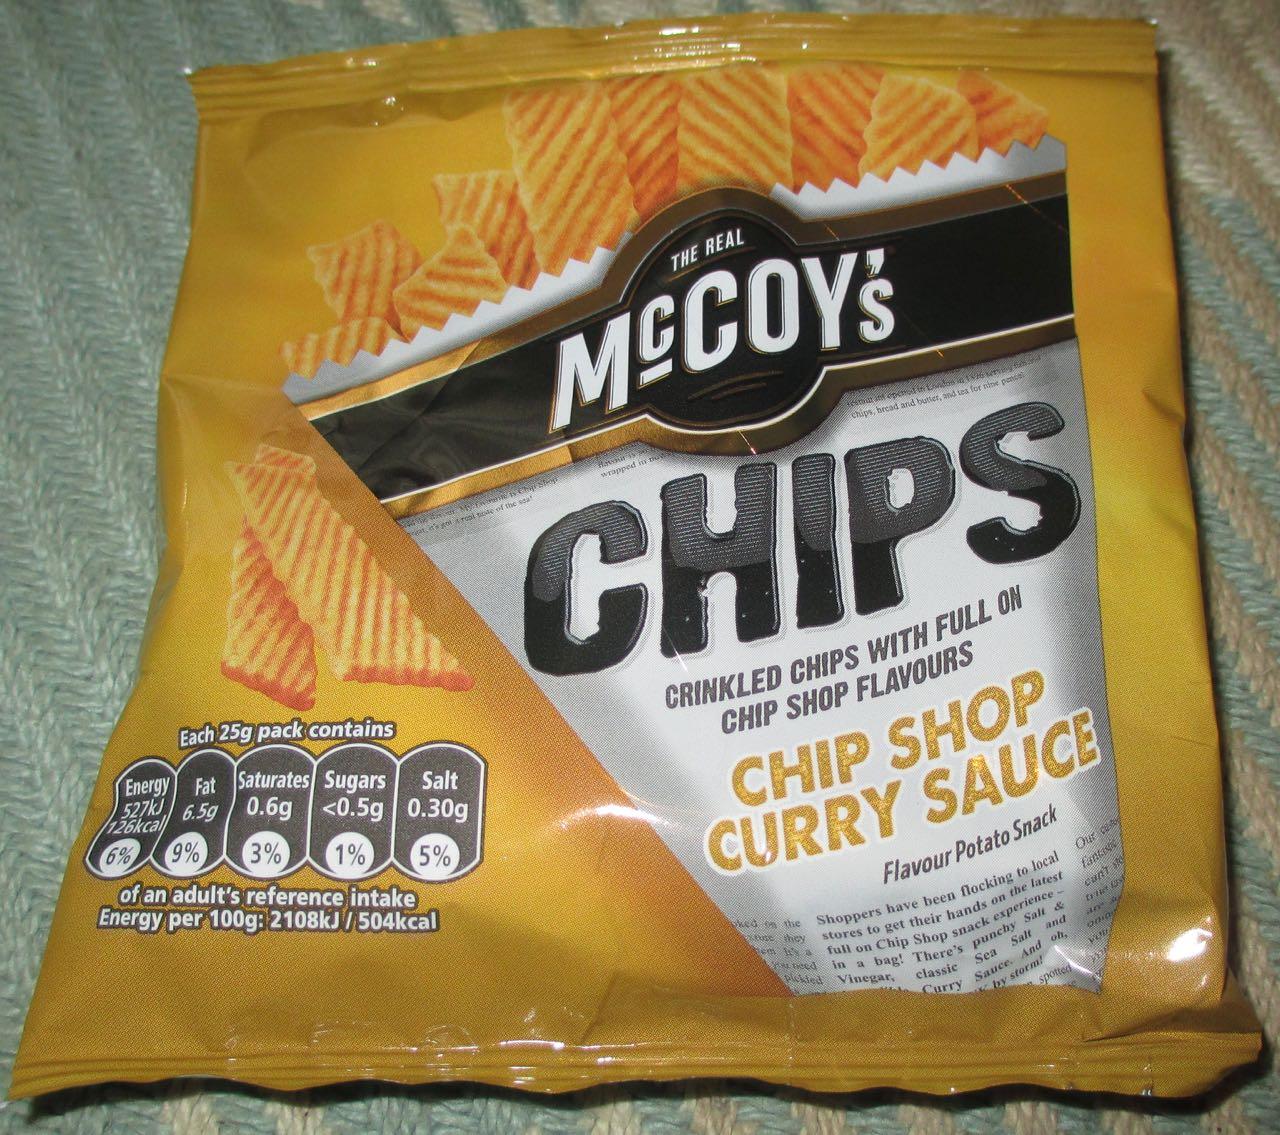 Foodstuff Finds Mccoys Chip Shop Curry Sauce Chips Crisp